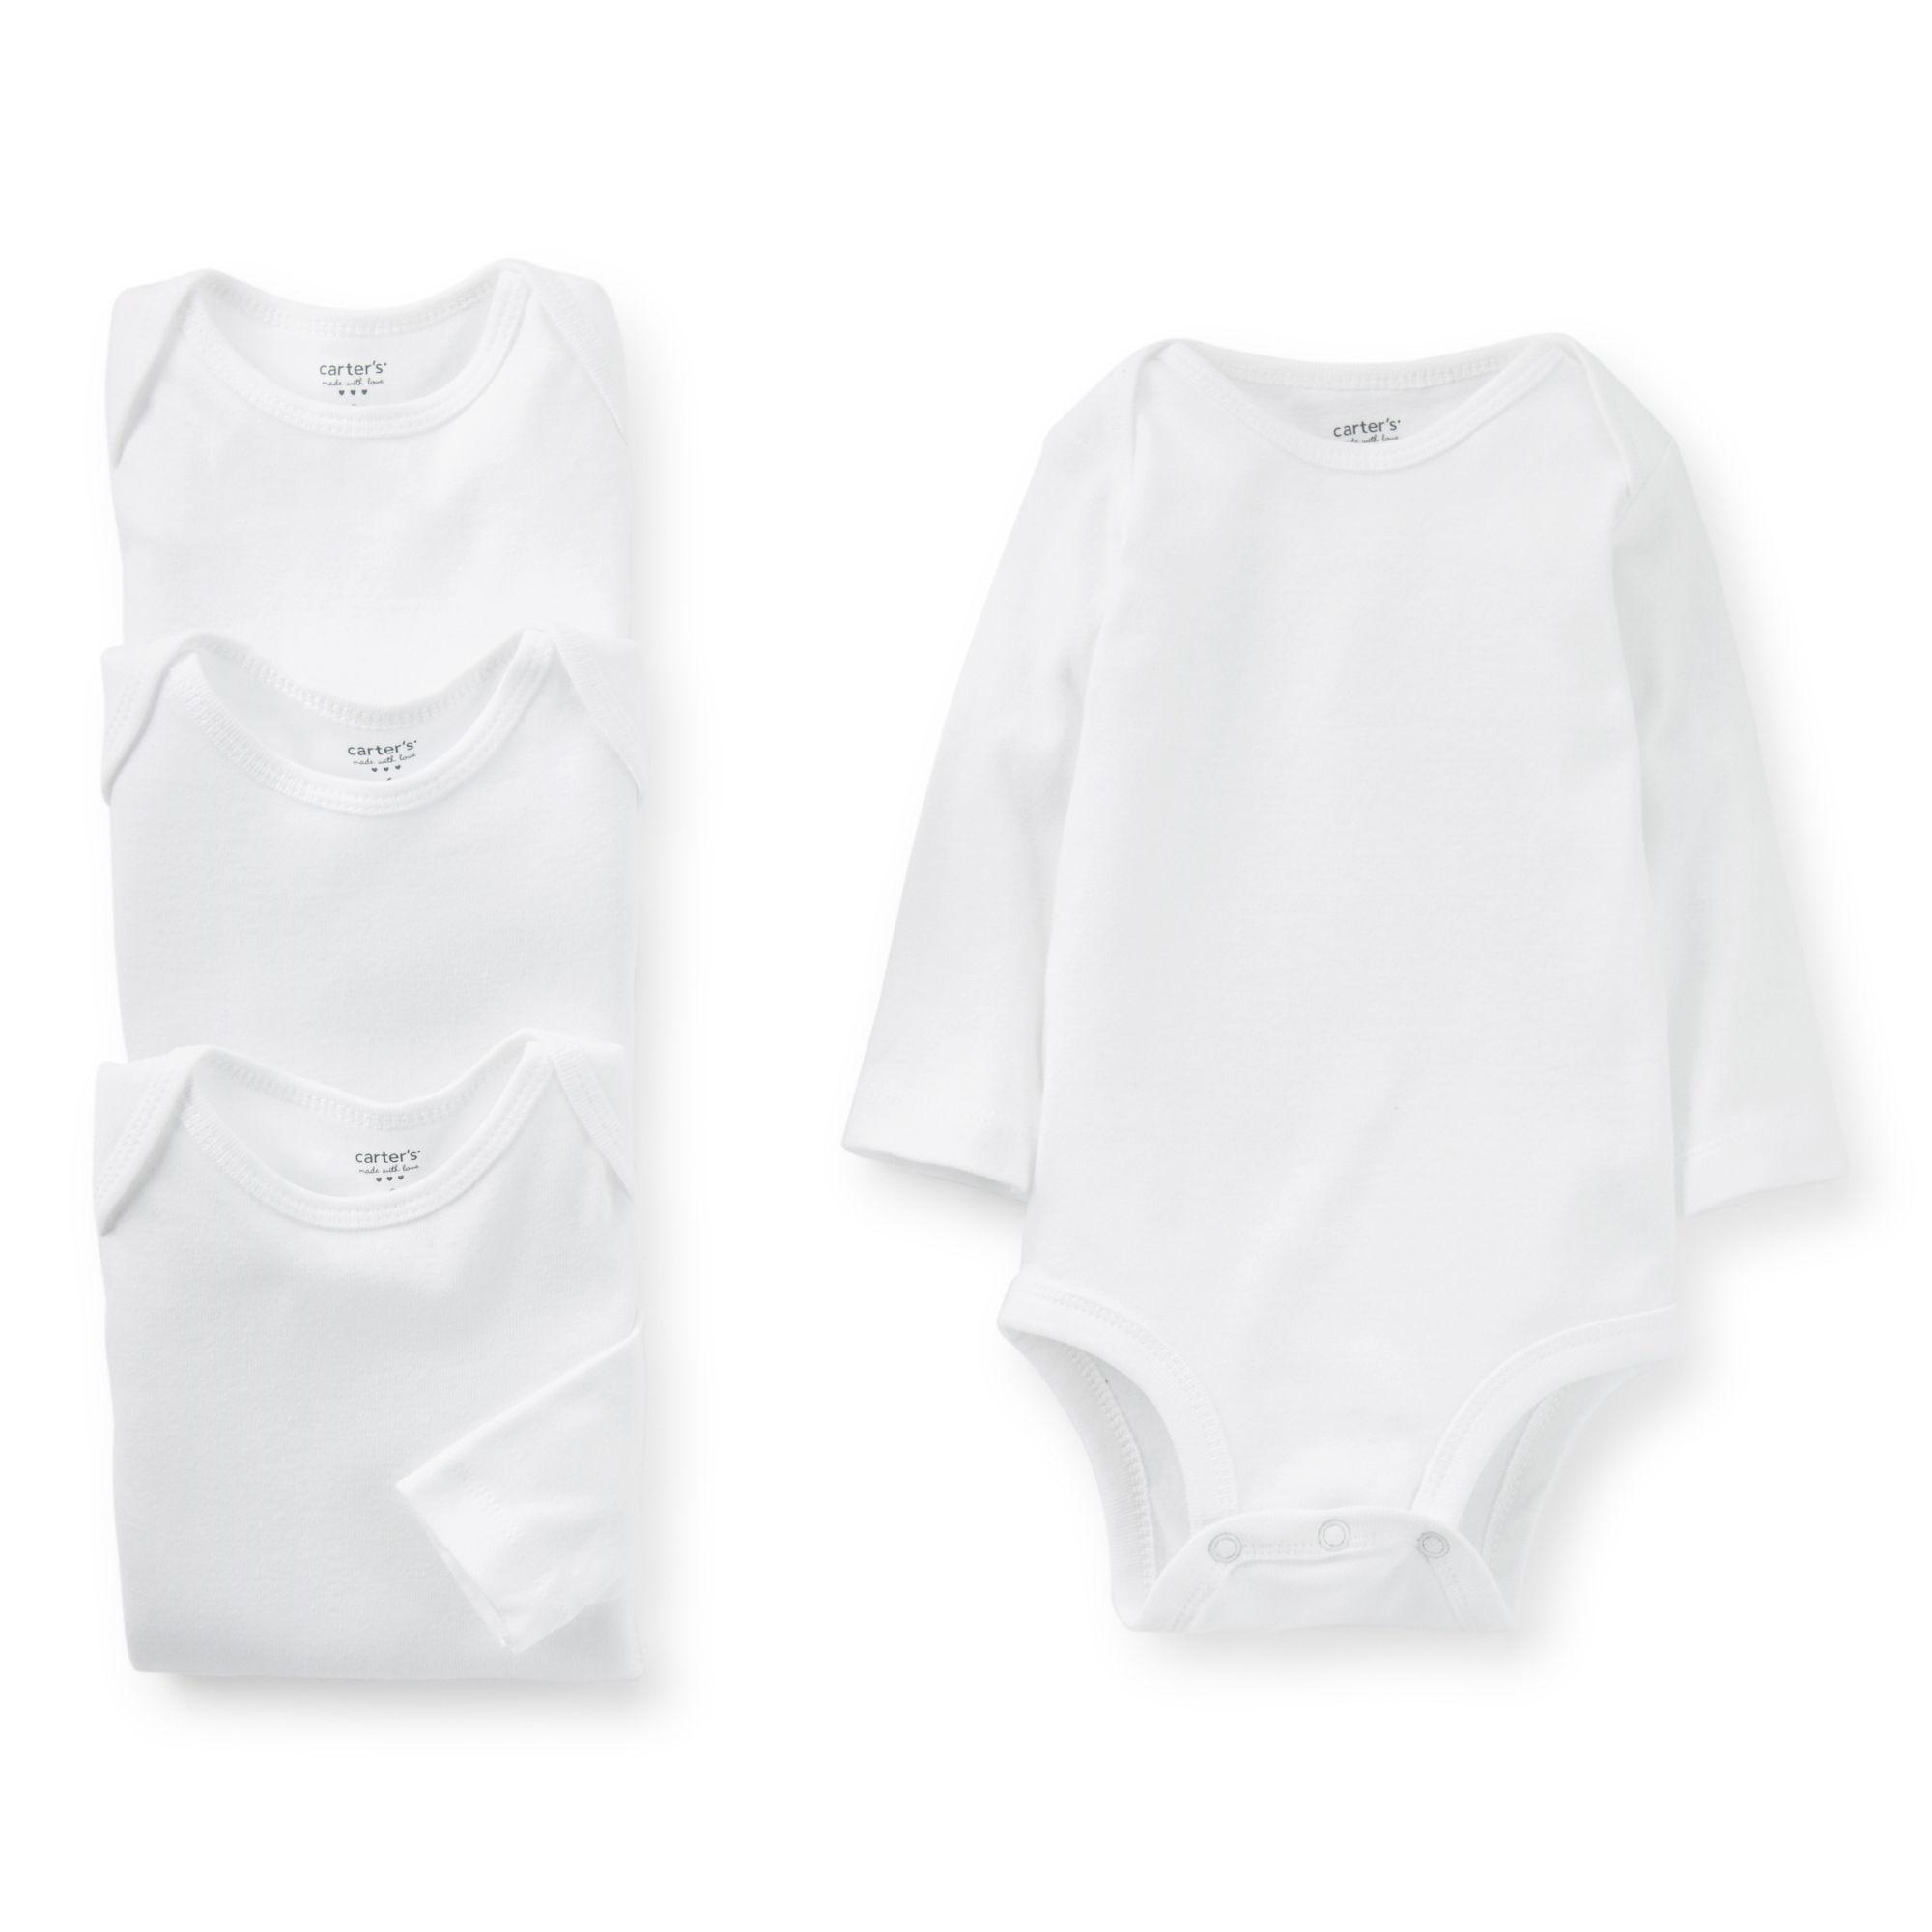 2a3b298d6 Carter's Unisex Baby White 4 Pack Long Sleeve Bodysuits - Newborn ...